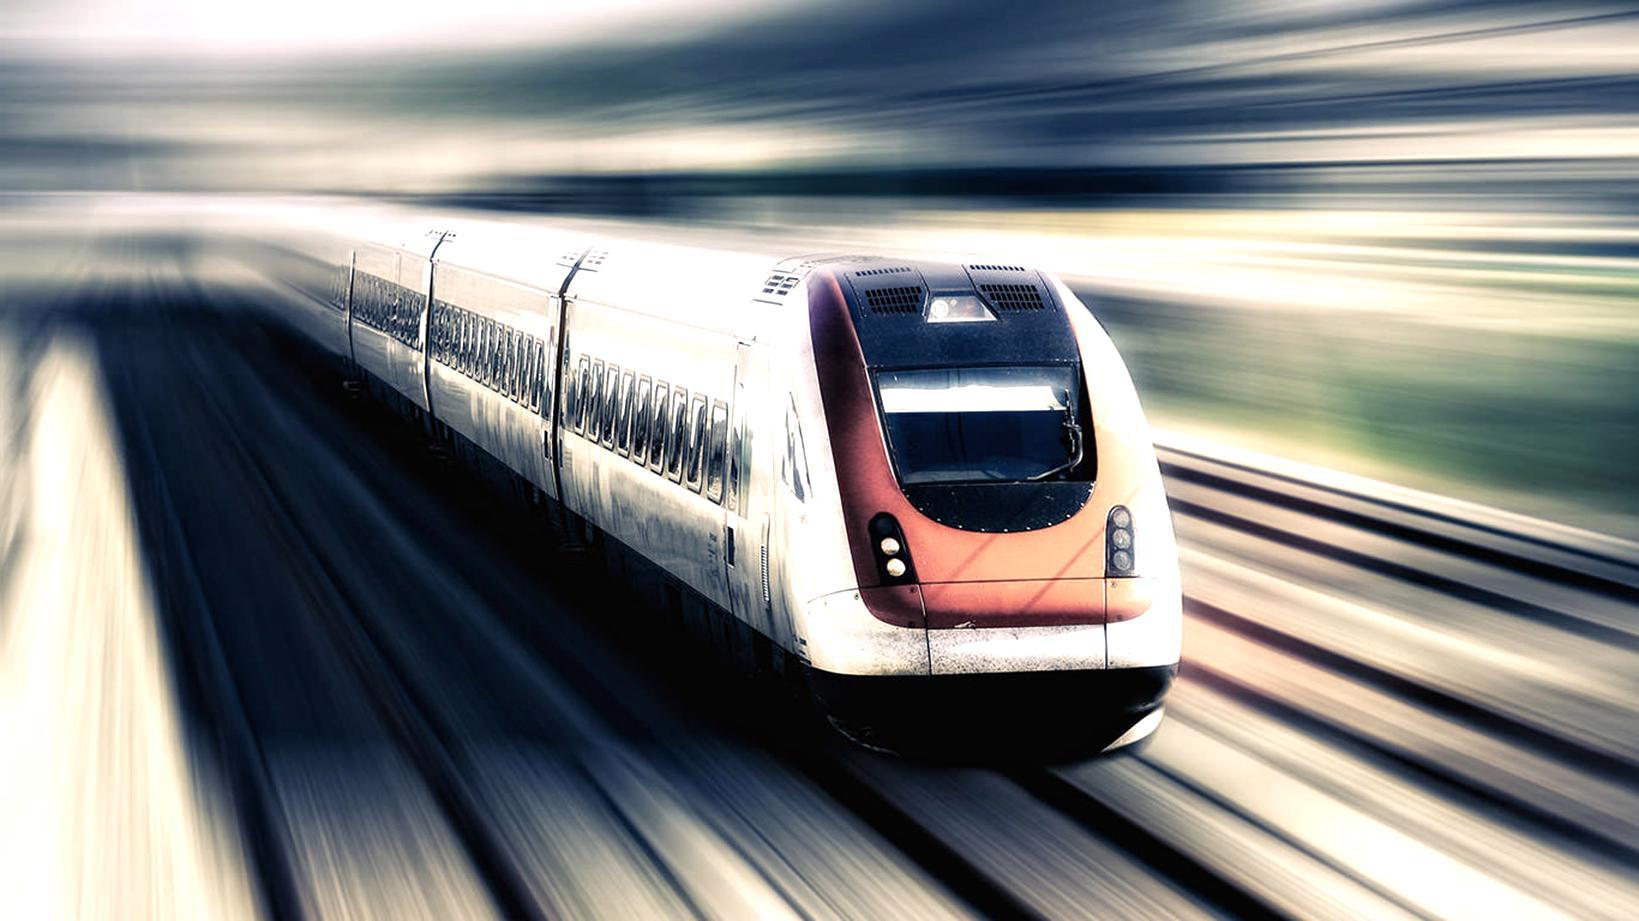 ferroviaire d'occasion